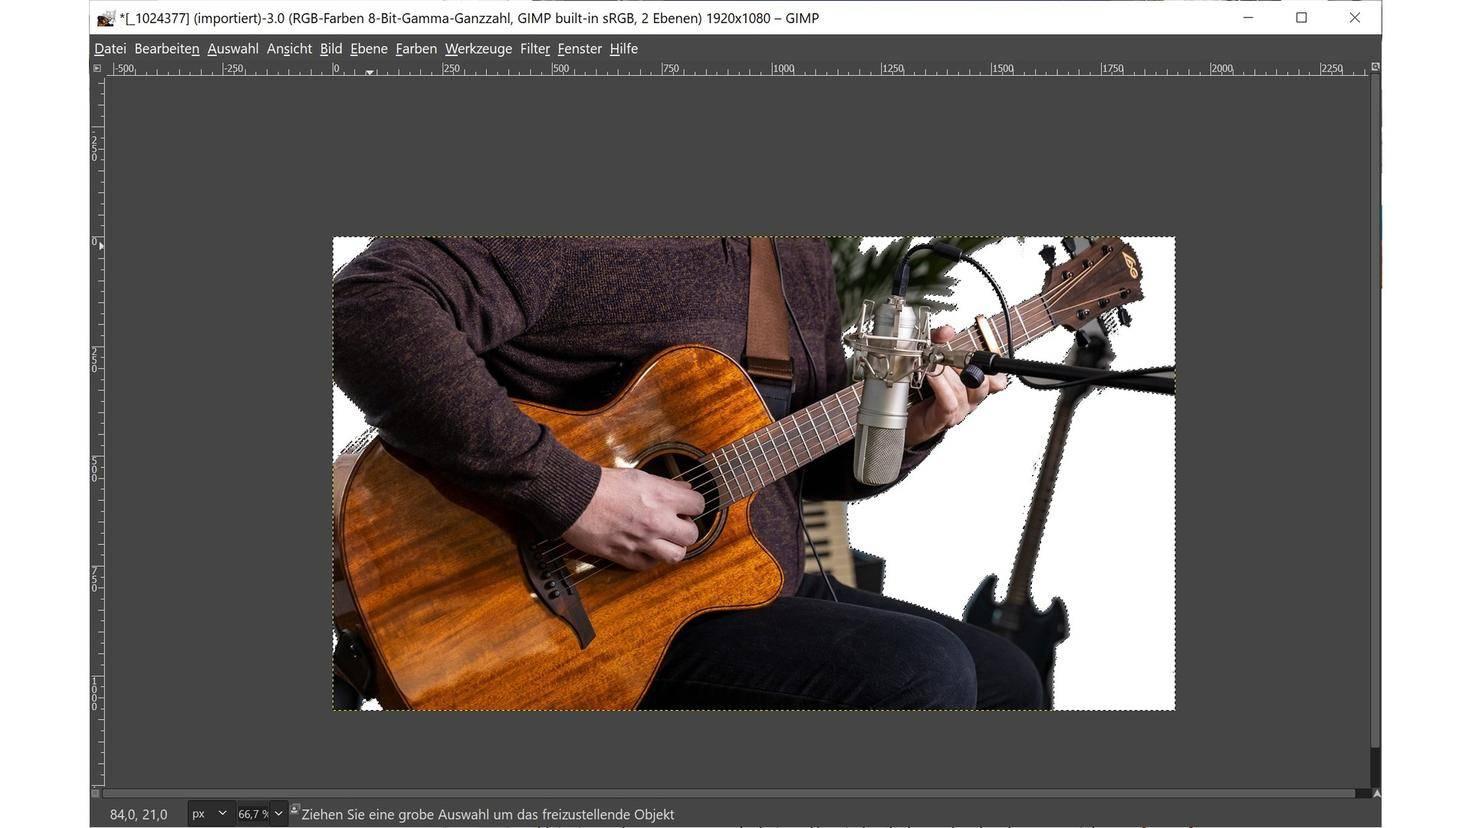 gimp-image-background-cropping-2